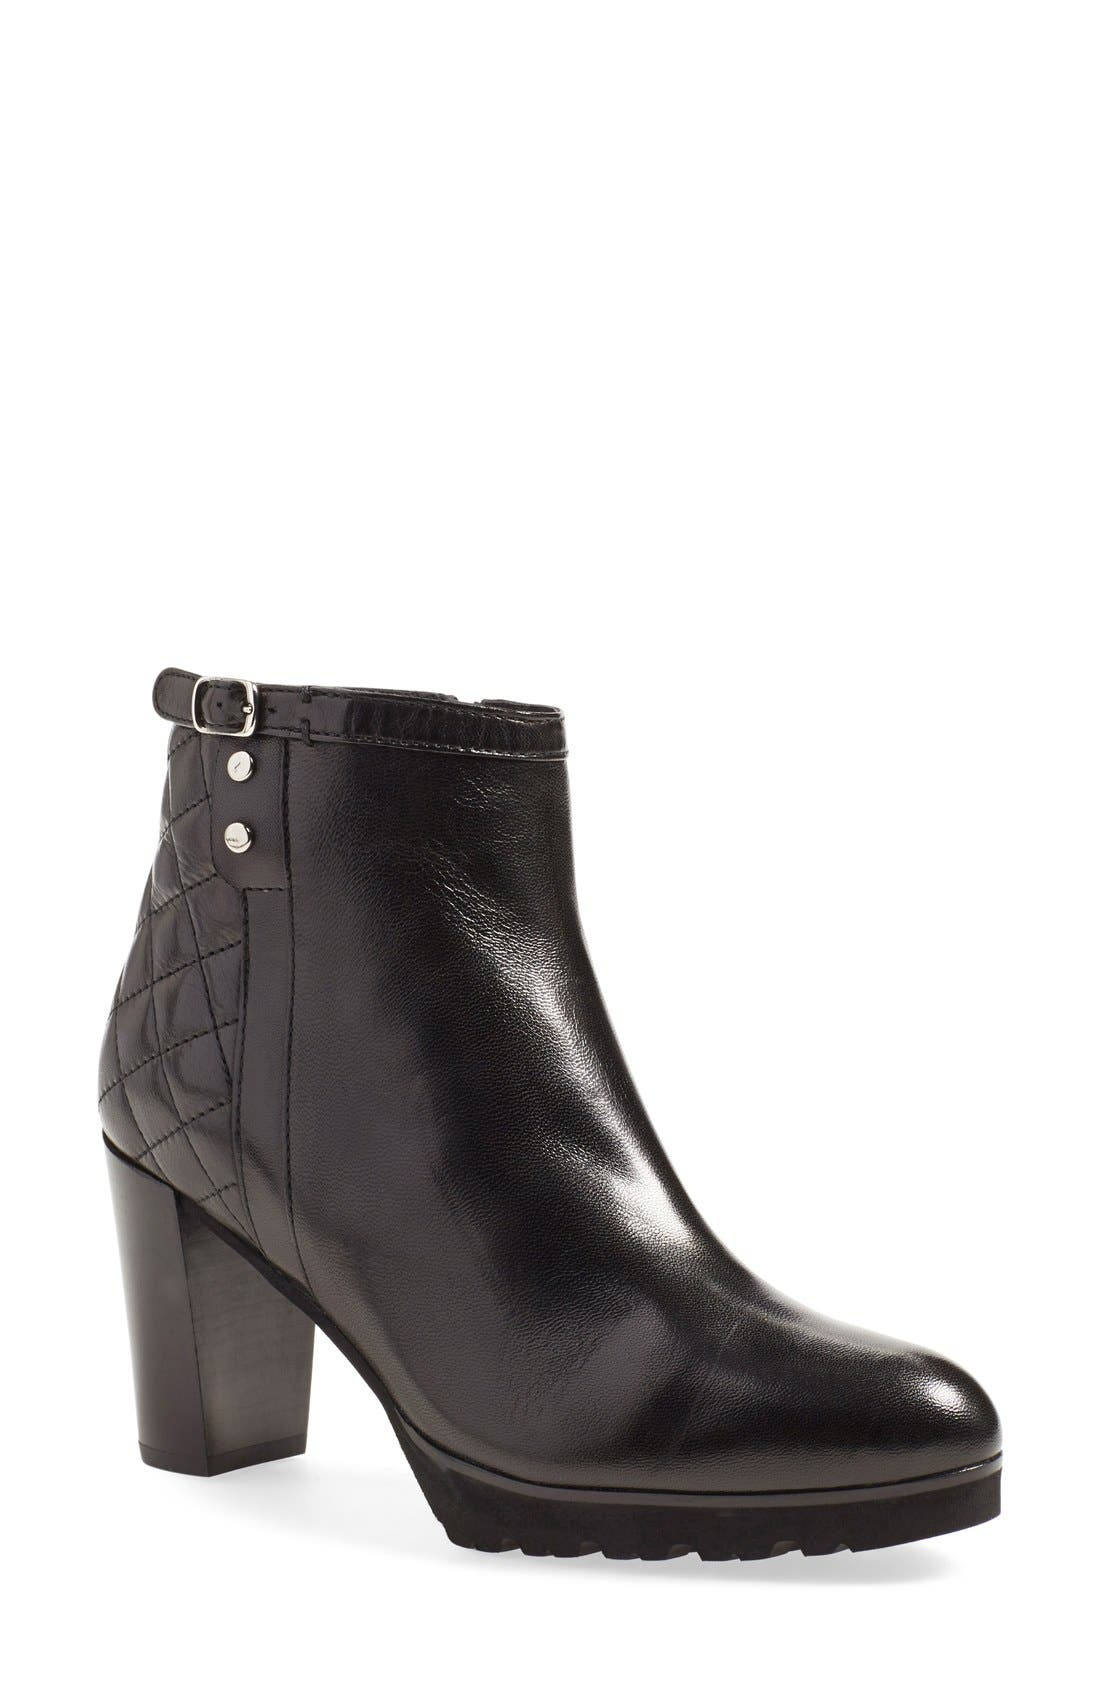 Alternate Image 1 Selected - AnyiLu 'Nicky' Boot (Women)